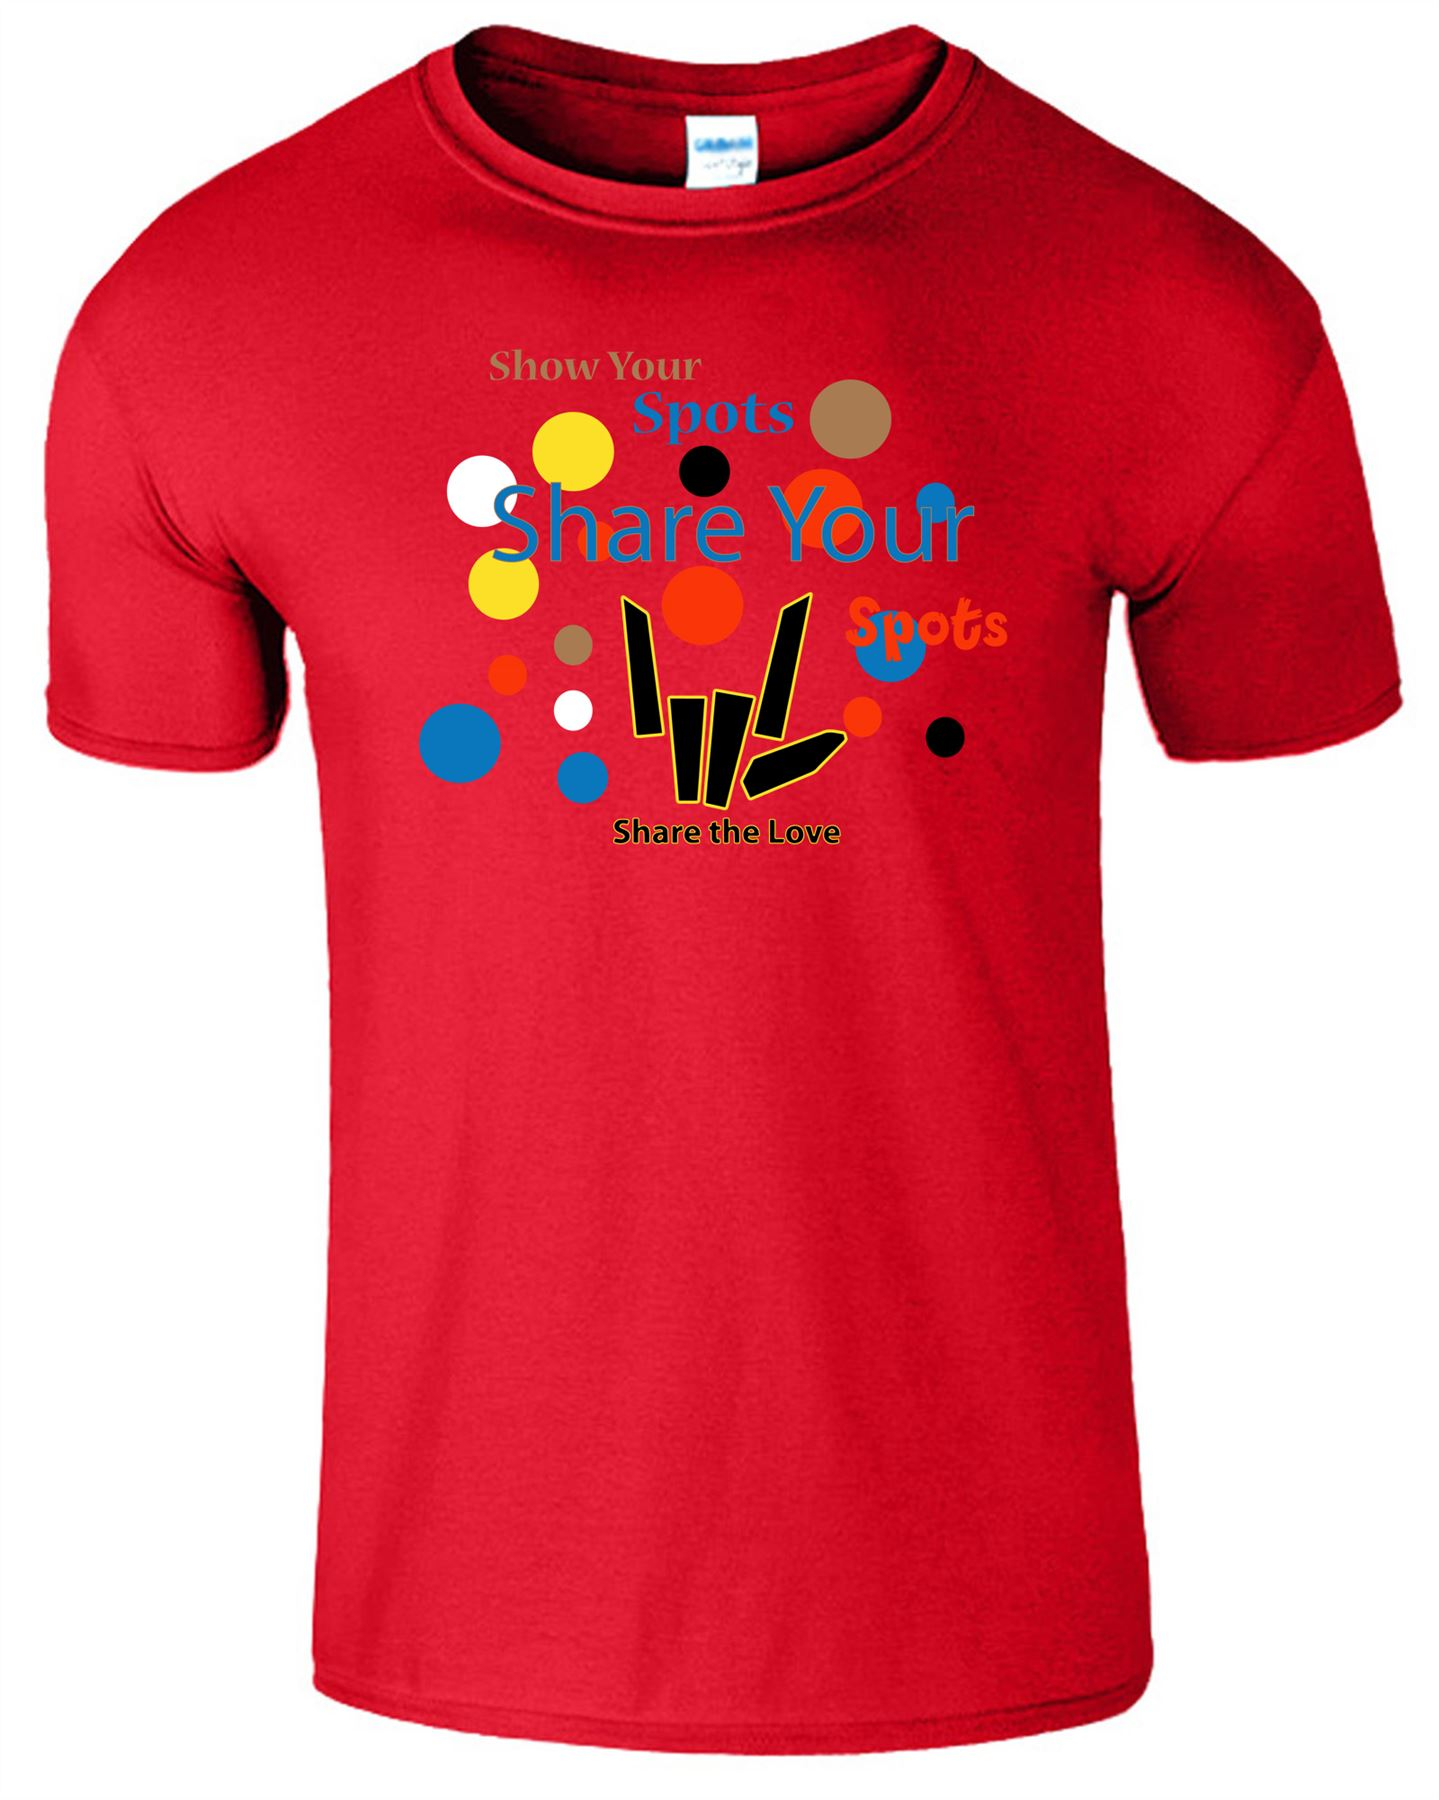 Mens Ladies Colorfull Logo TShirt Children Boys Girls Tee Top T-Shirt All Sizes